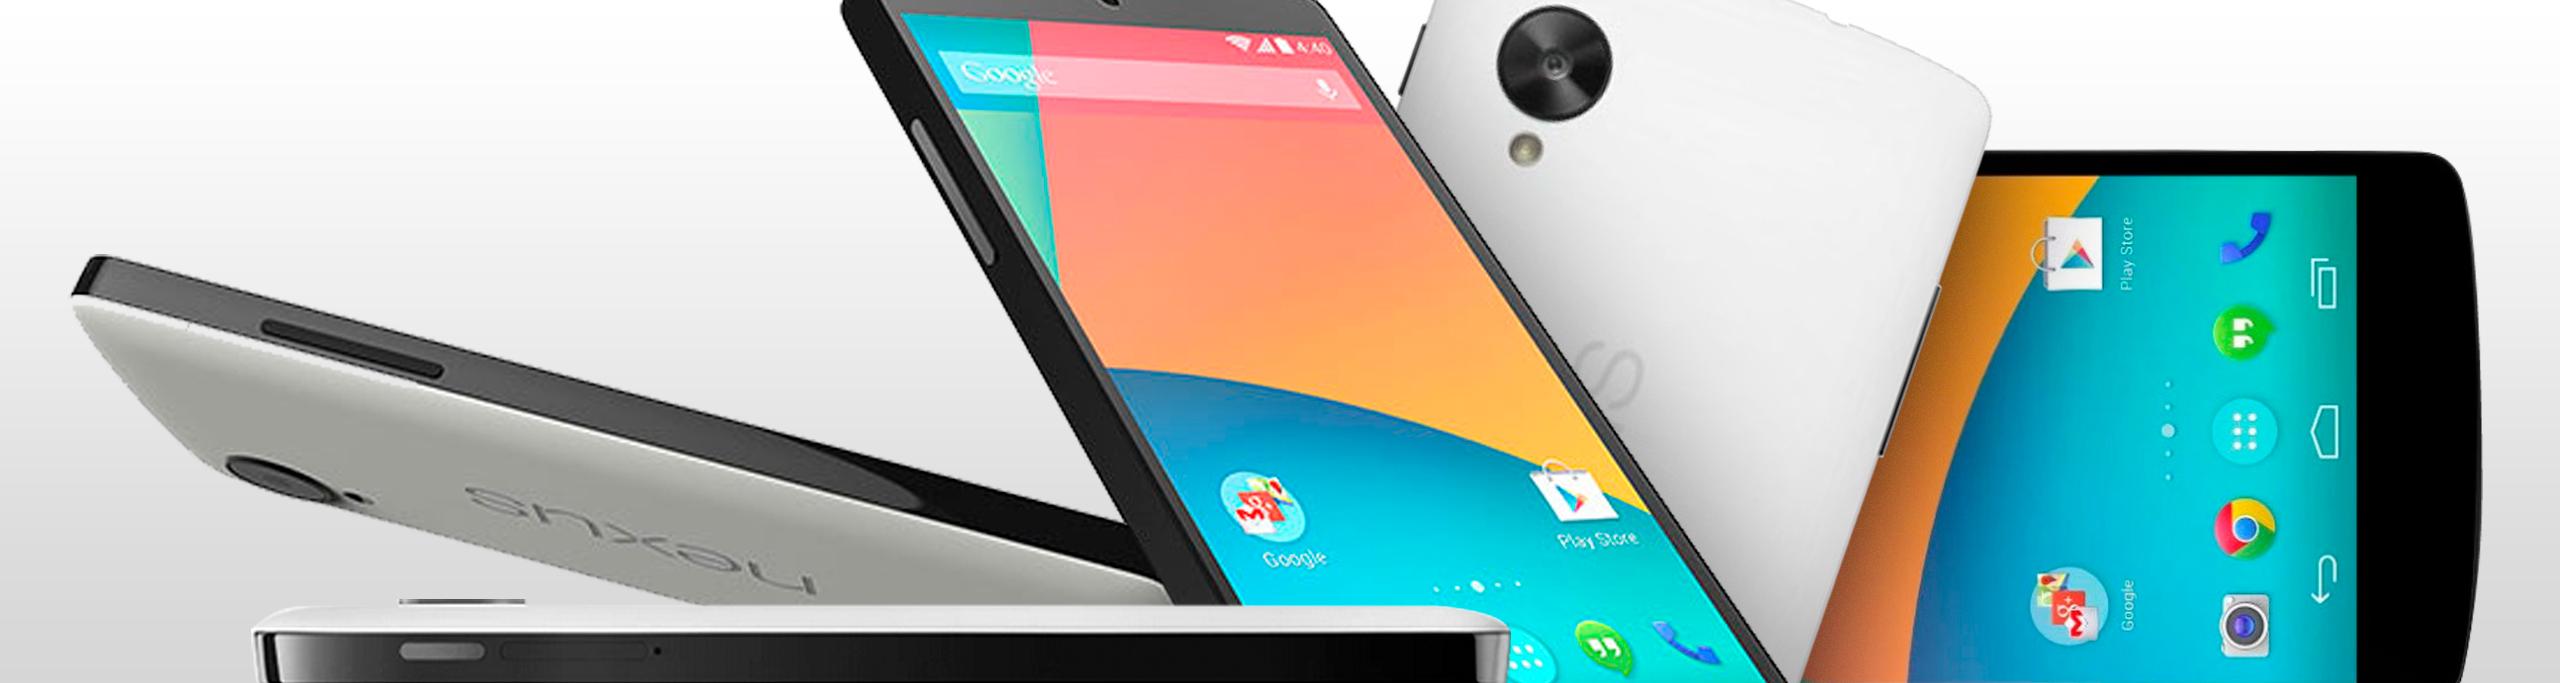 Google Nexus 5 (D820)